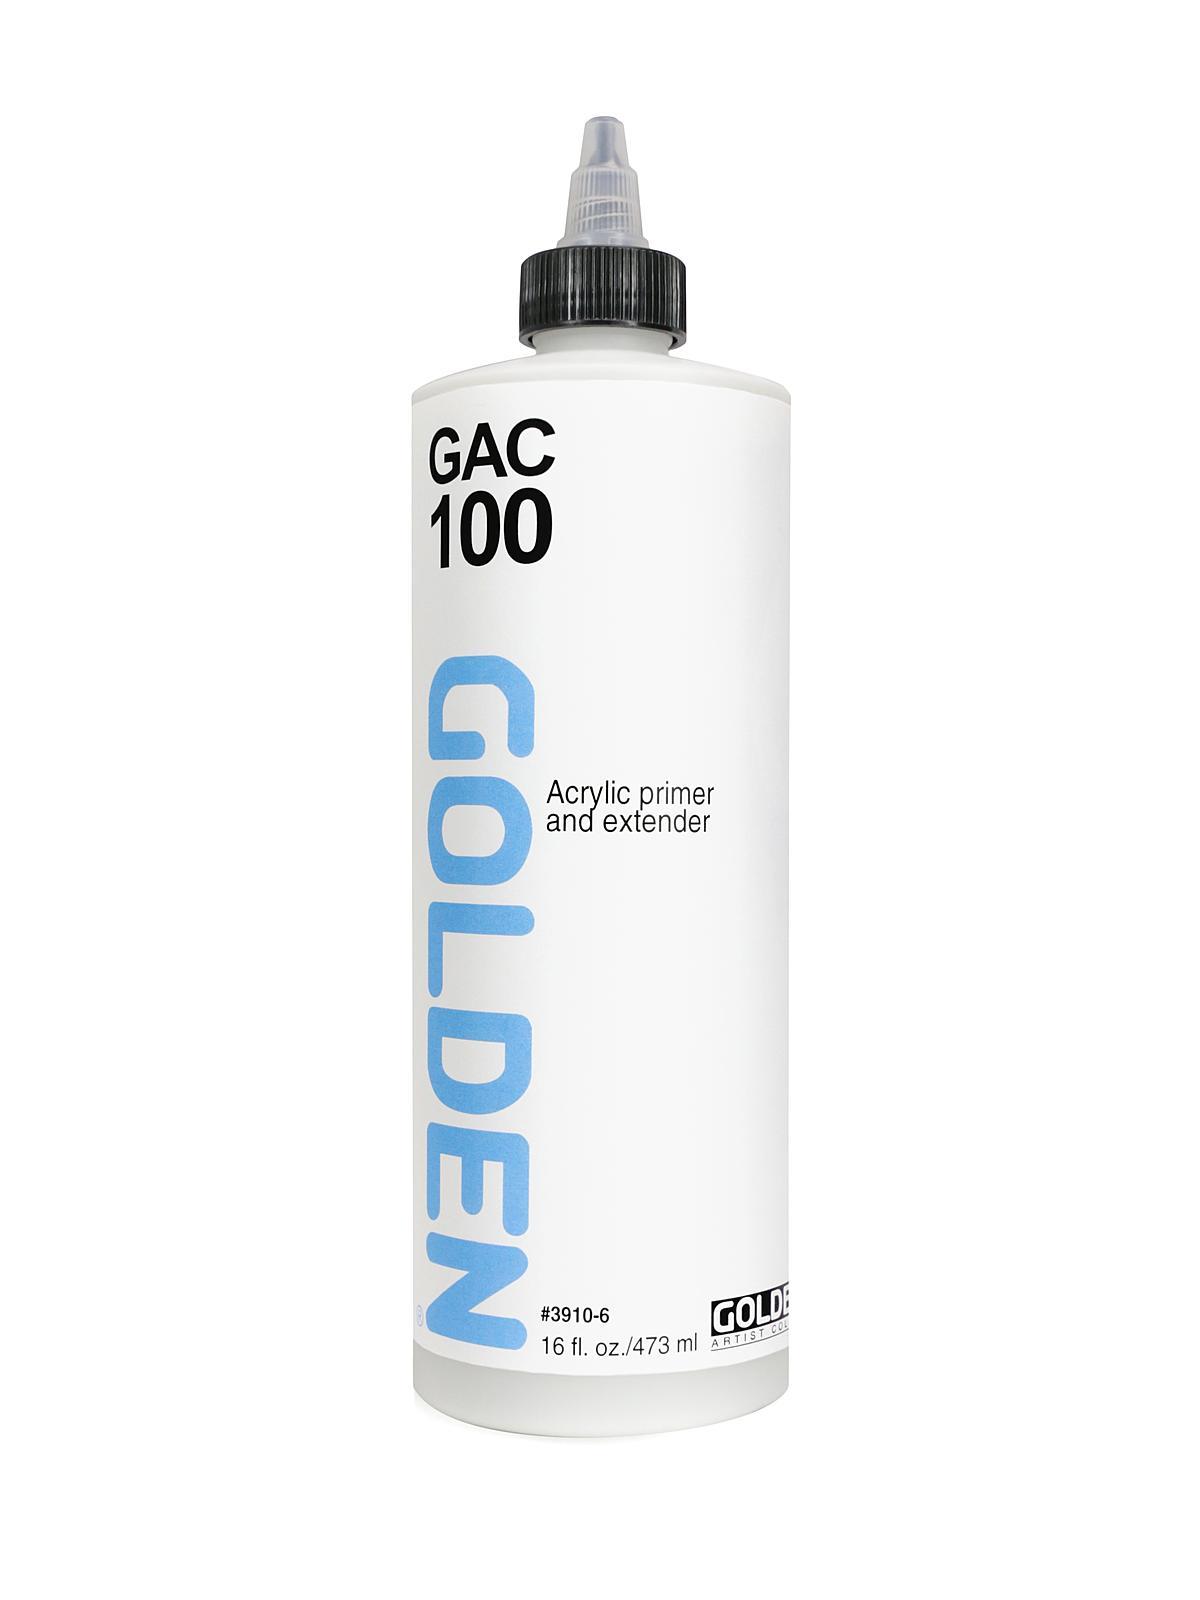 Golden Universal Tarot: Golden GAC 100 Universal Acrylic Polymer Medium